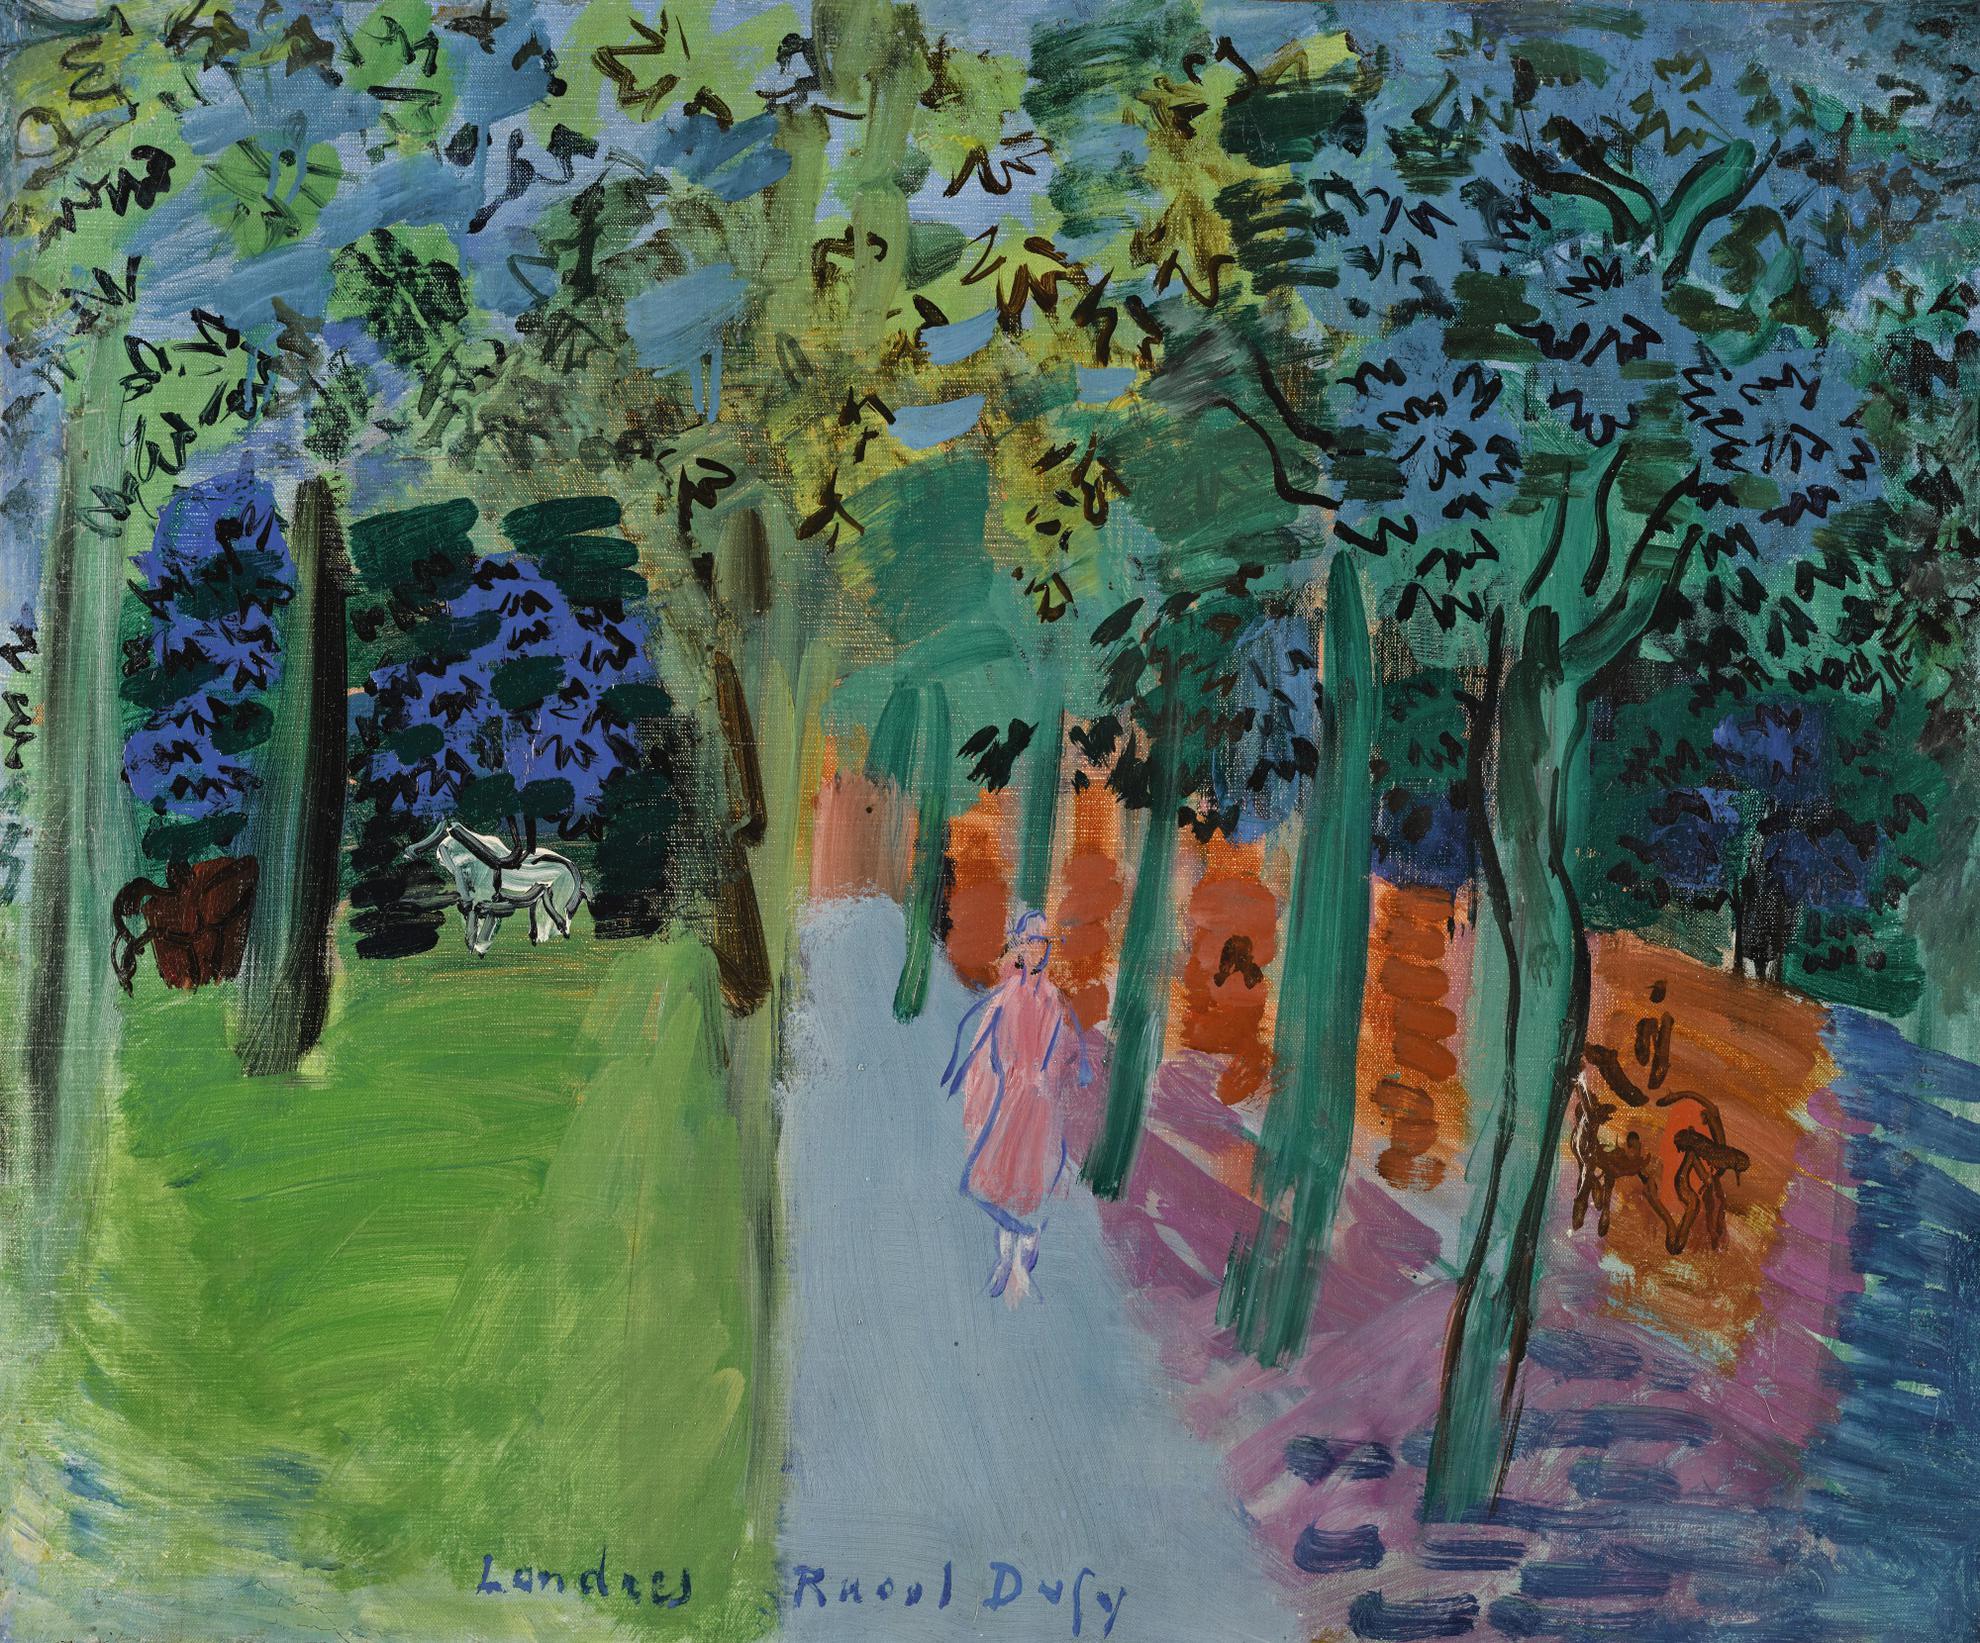 Raoul Dufy-Paysage Londonien-1934